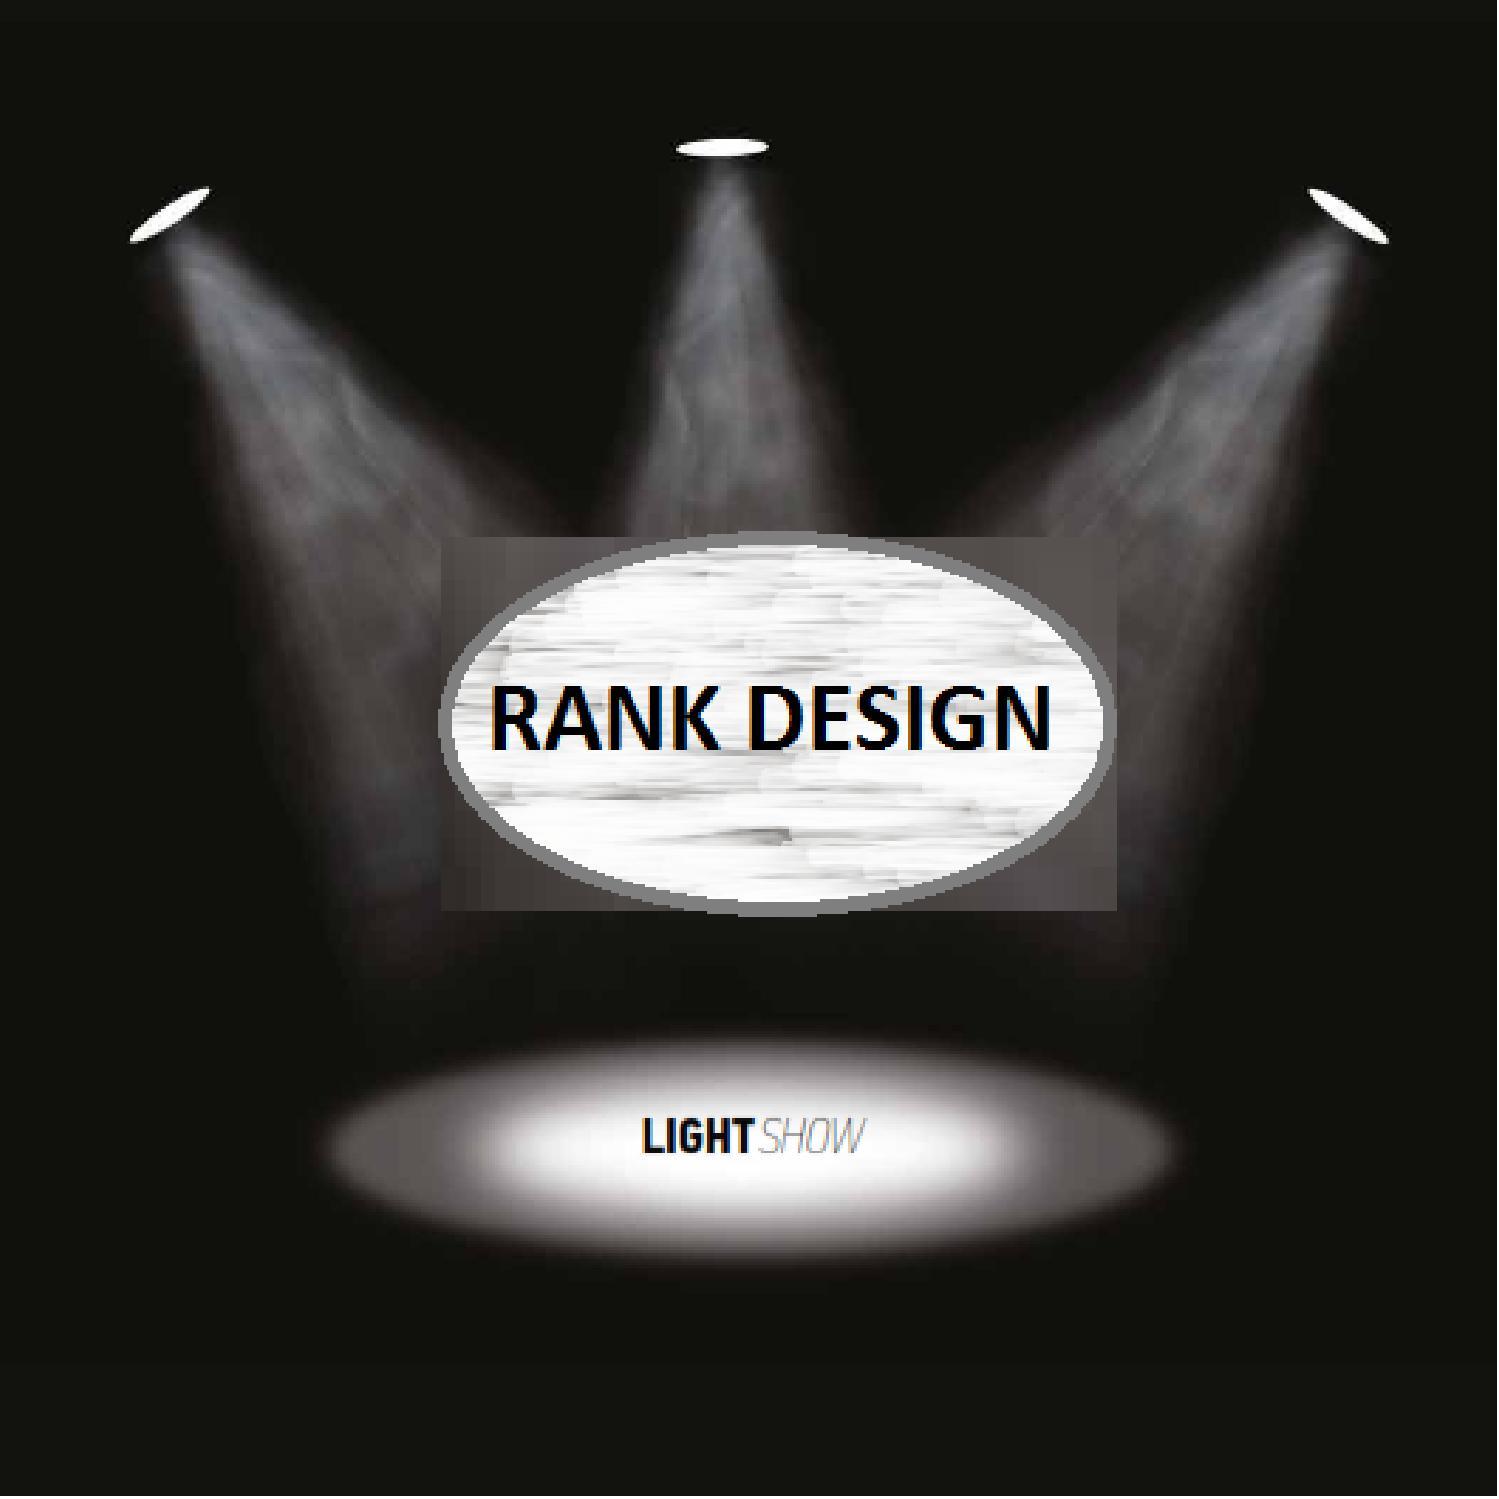 c7f24c2b49 Rank Design Lightings by rankgroup - issuu